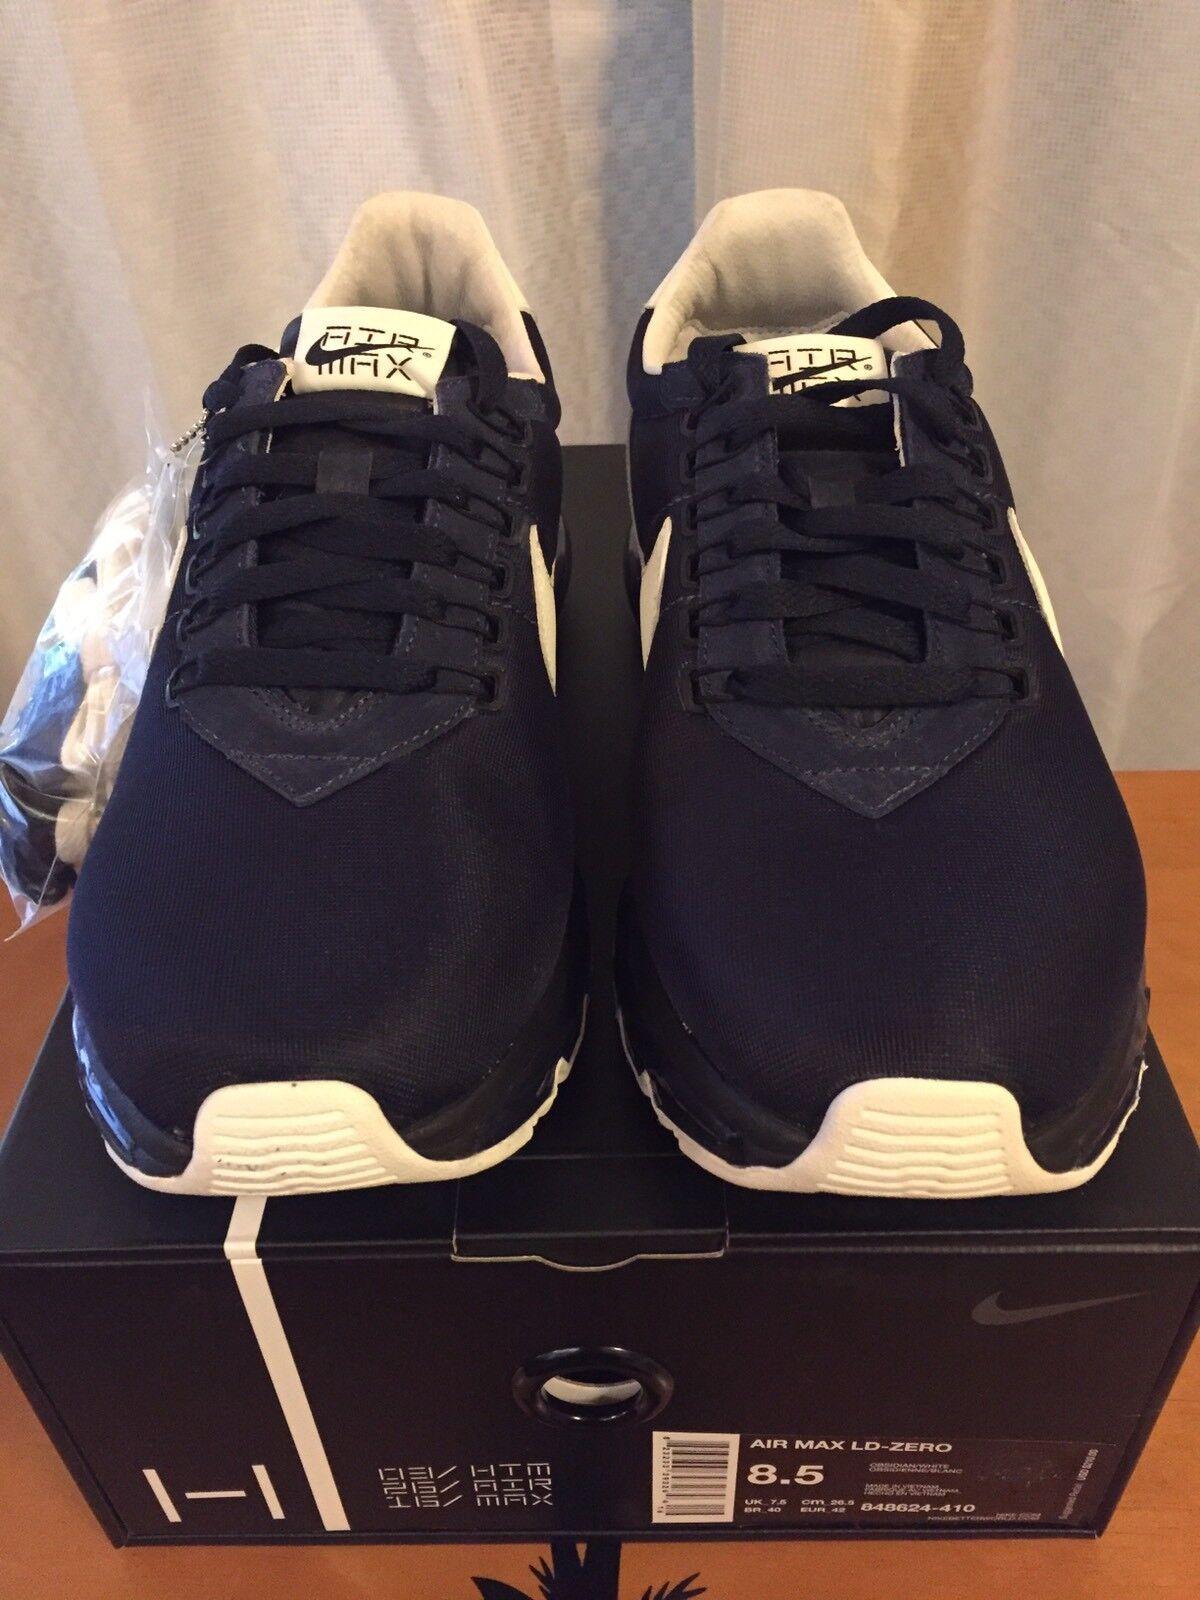 Nike air max: zero ossidiana bianco / 848624 410 sz hiroshi fujiwara